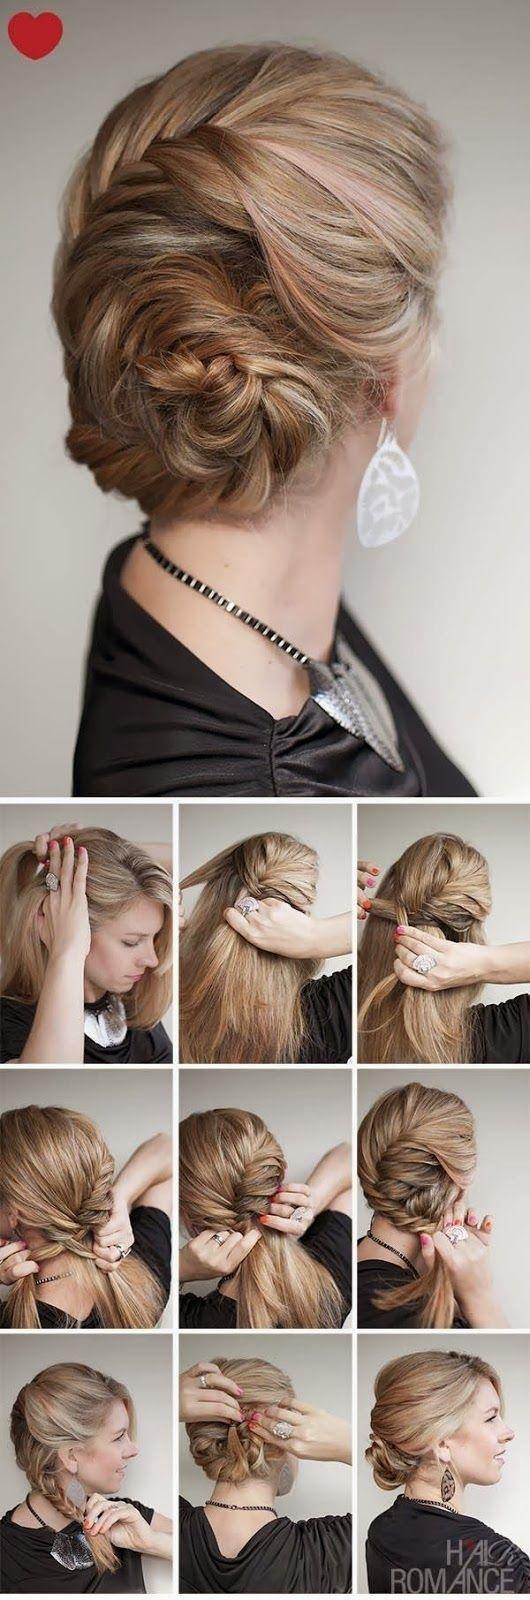 Причёска ракушка своими руками на короткие волосы